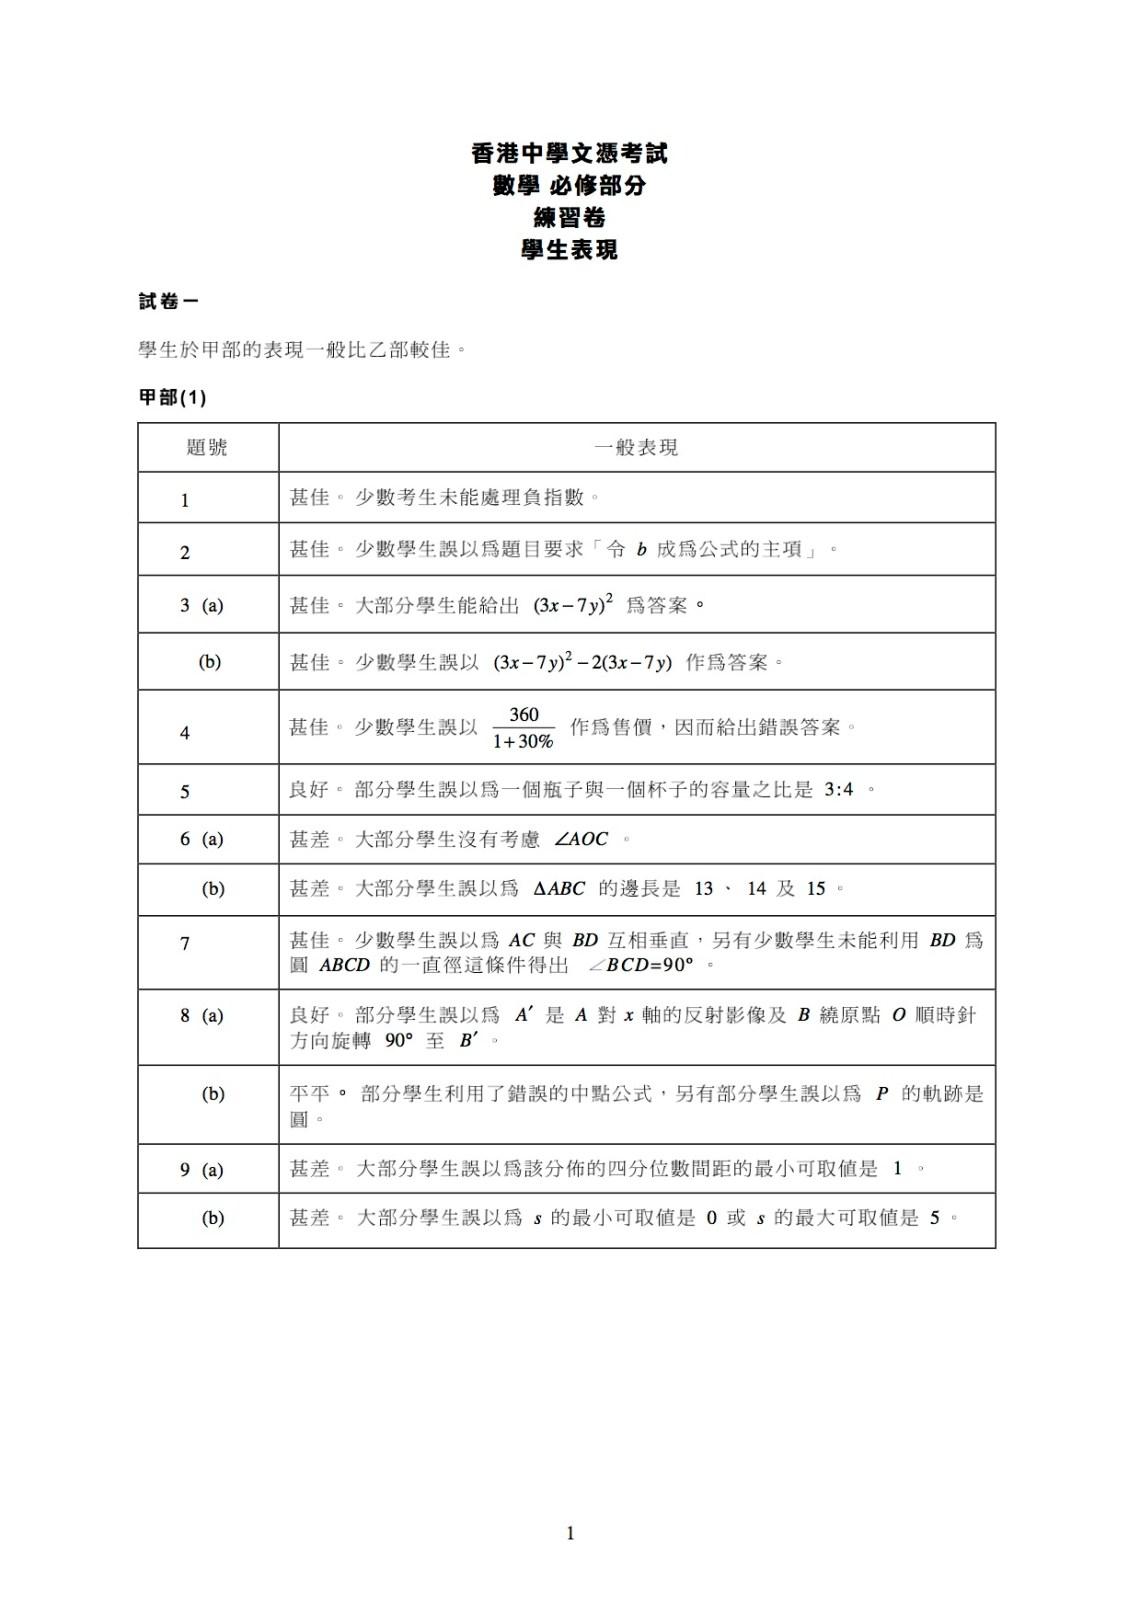 [2012DSE] Mathematics Compulsory Part數學必修部分 Practice paper 練習卷 – 公開試資源庫